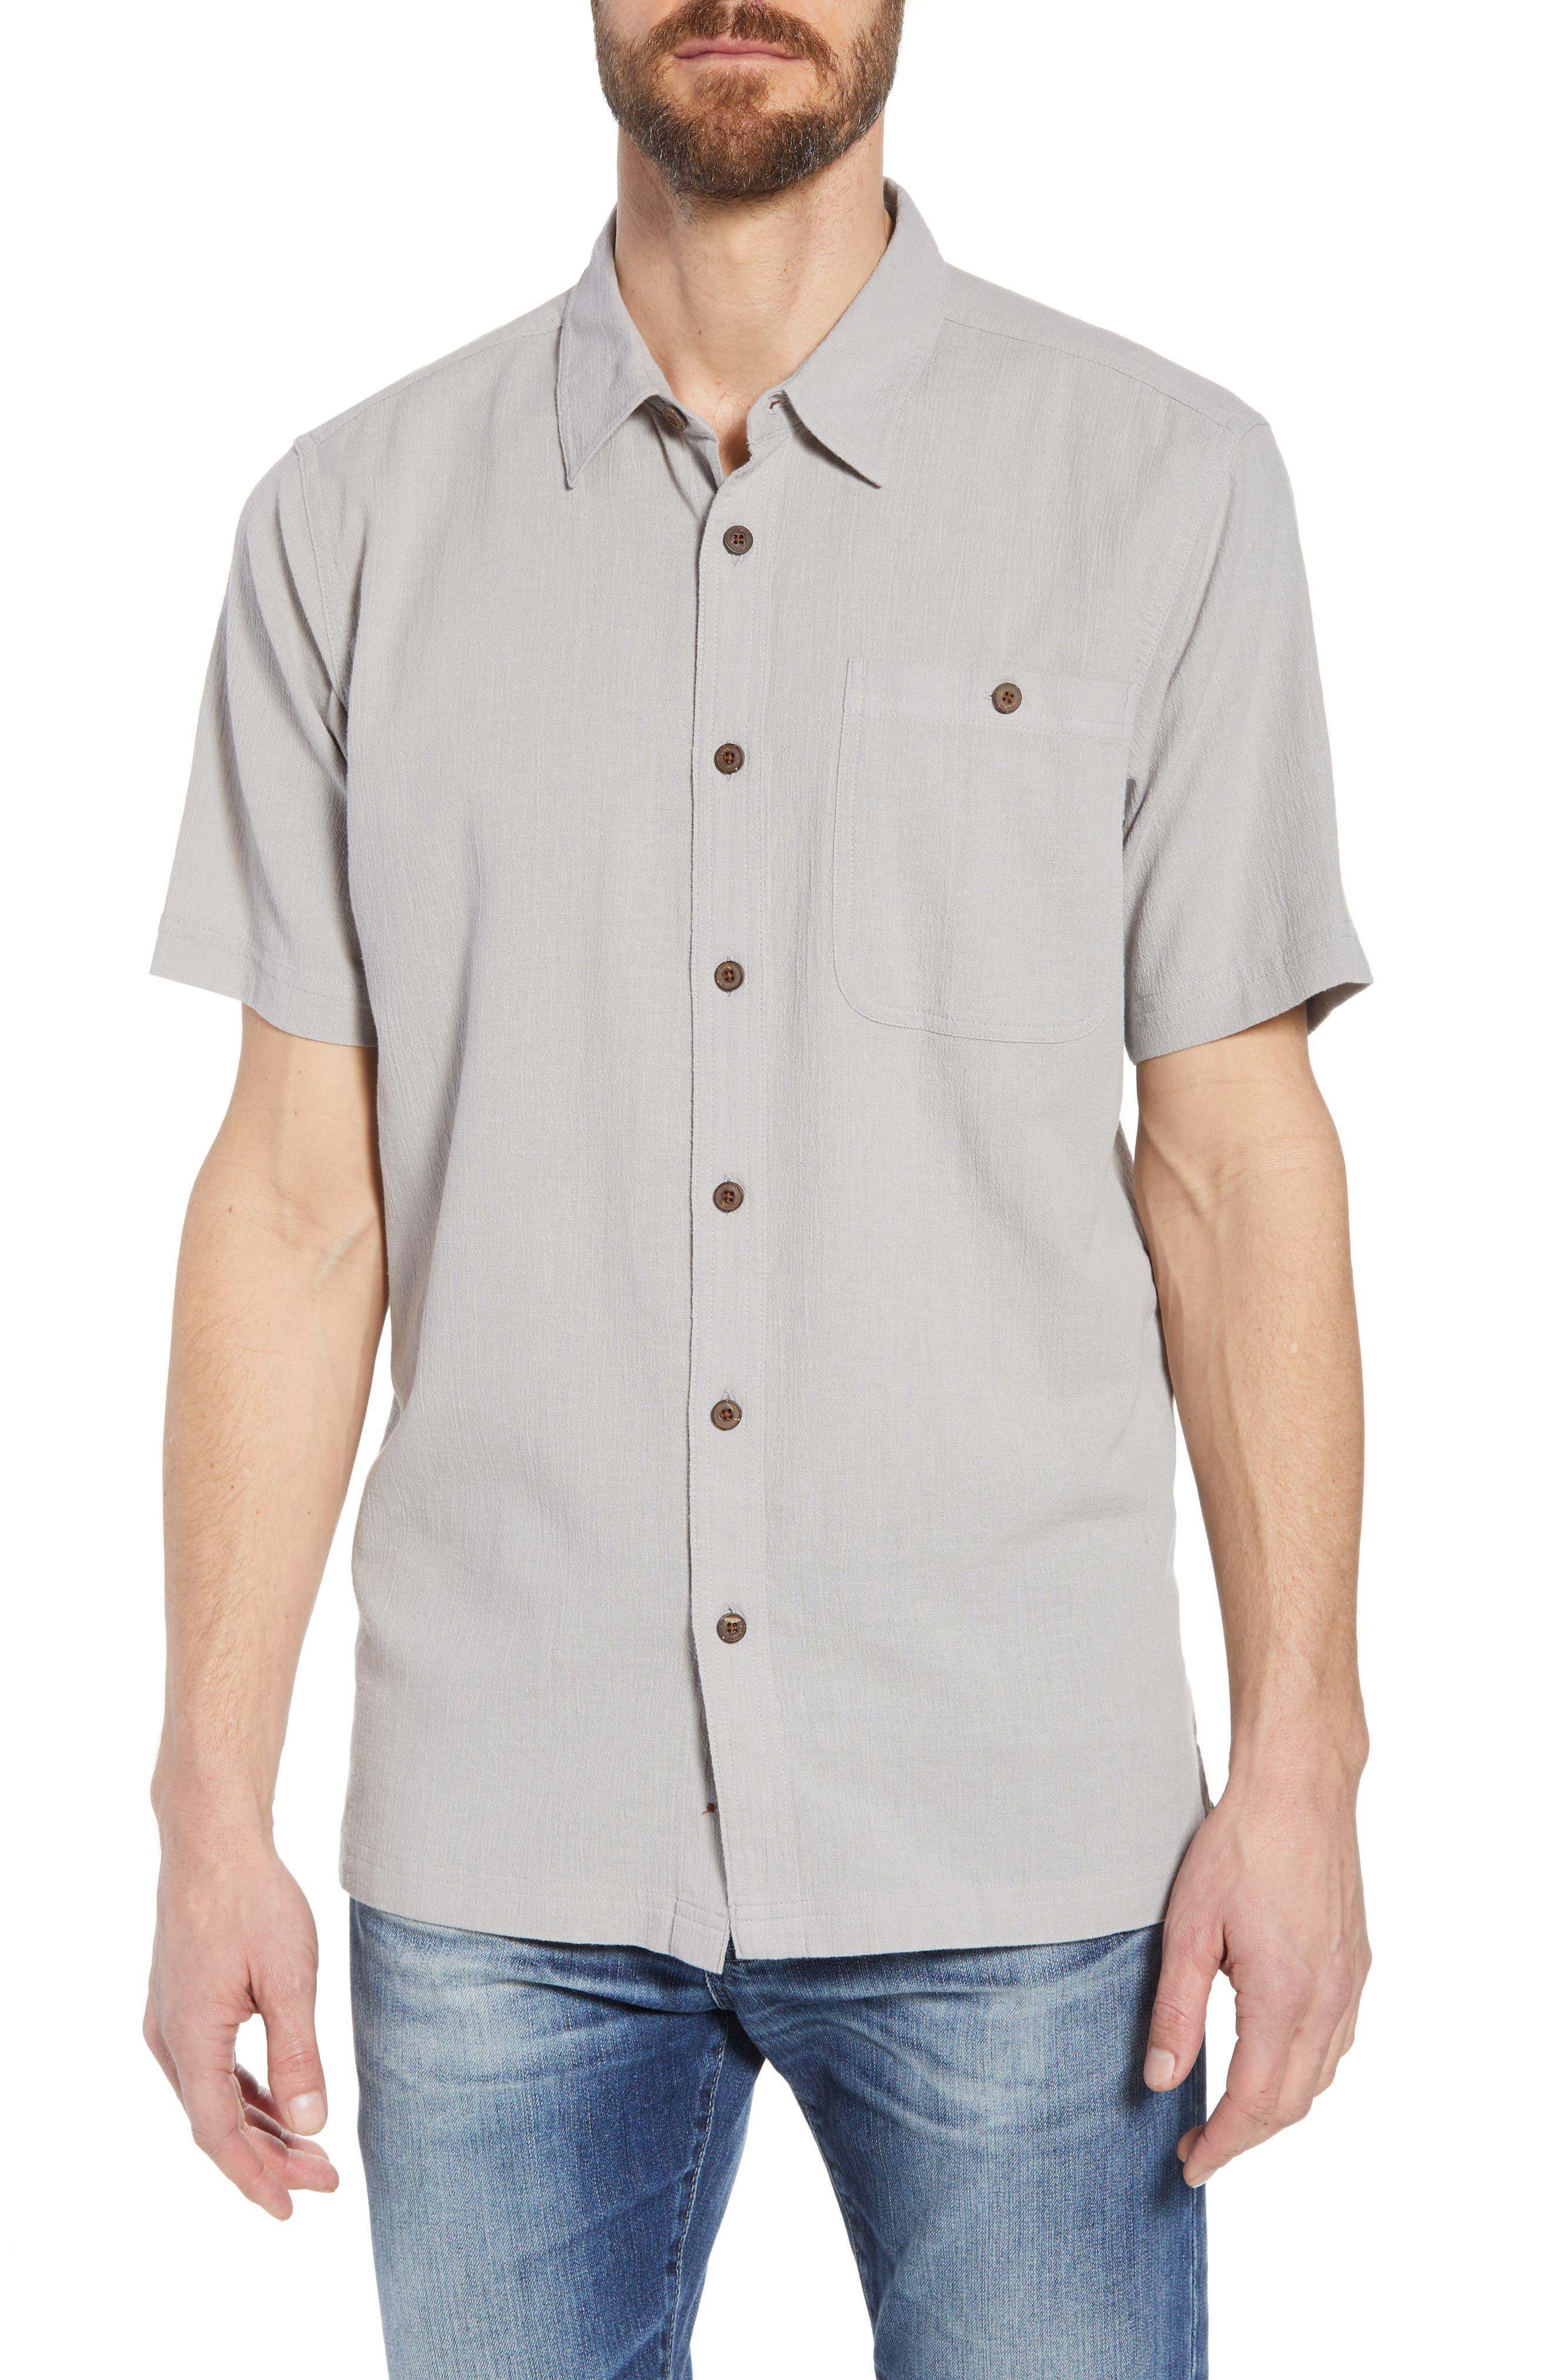 'A/C<sup>®</sup>' Regular Fit Organic Cotton Short Sleeve Sport Shirt,                         Main,                         color, 022